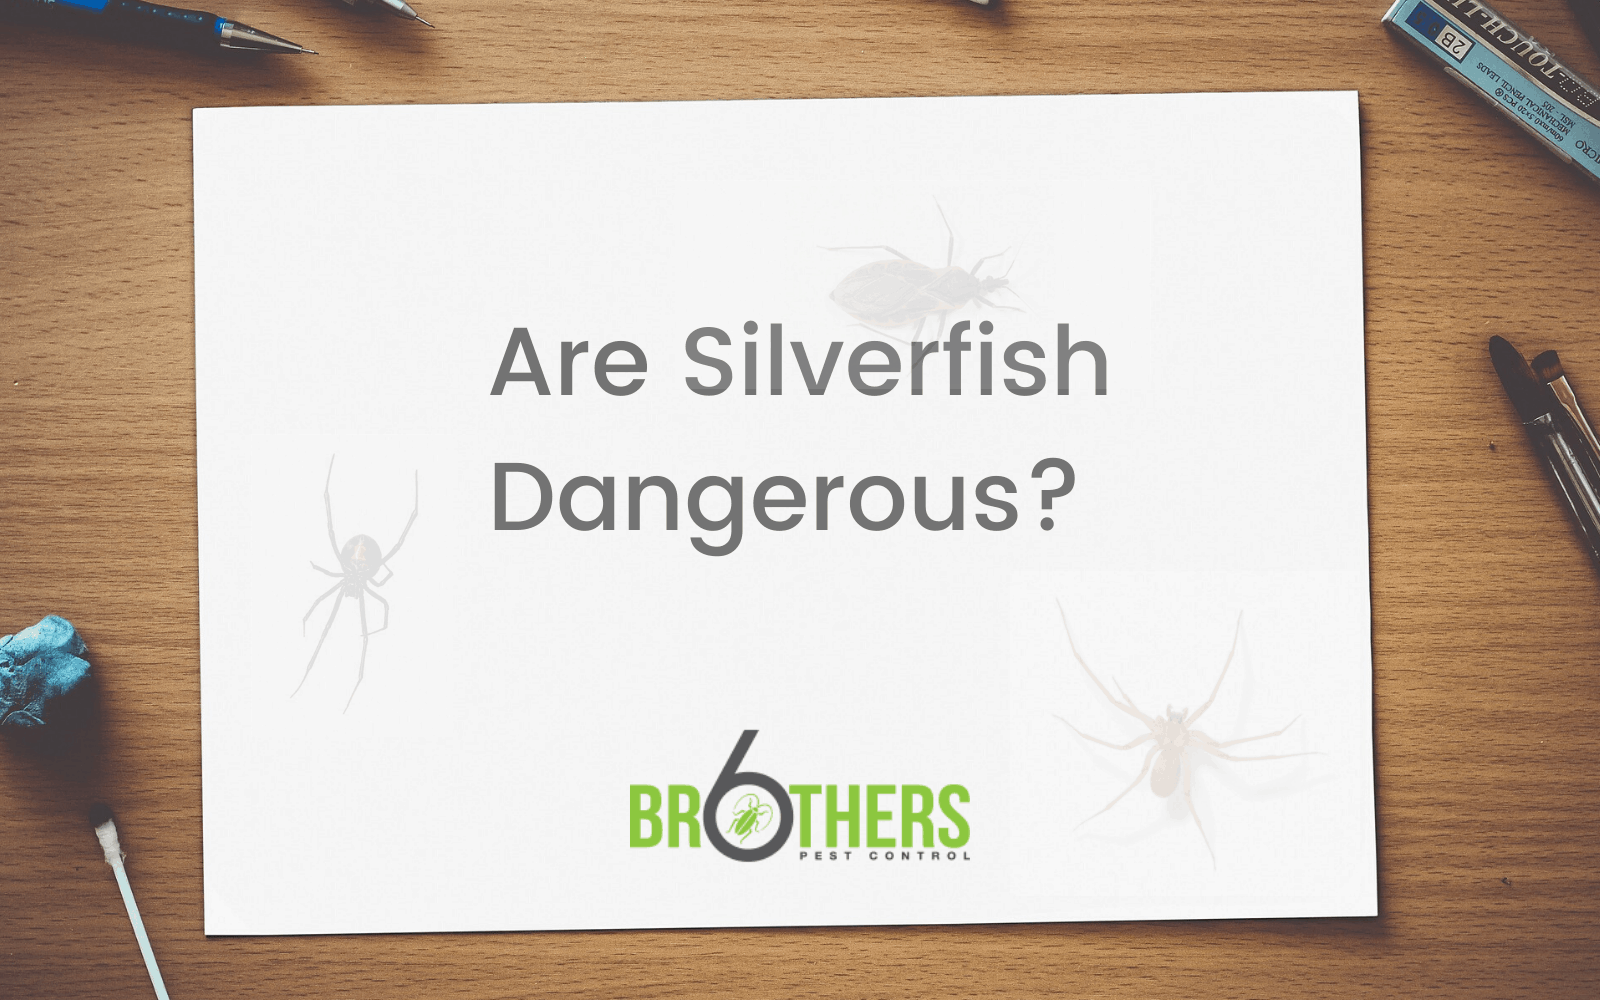 Are Silverfish Dangerous?